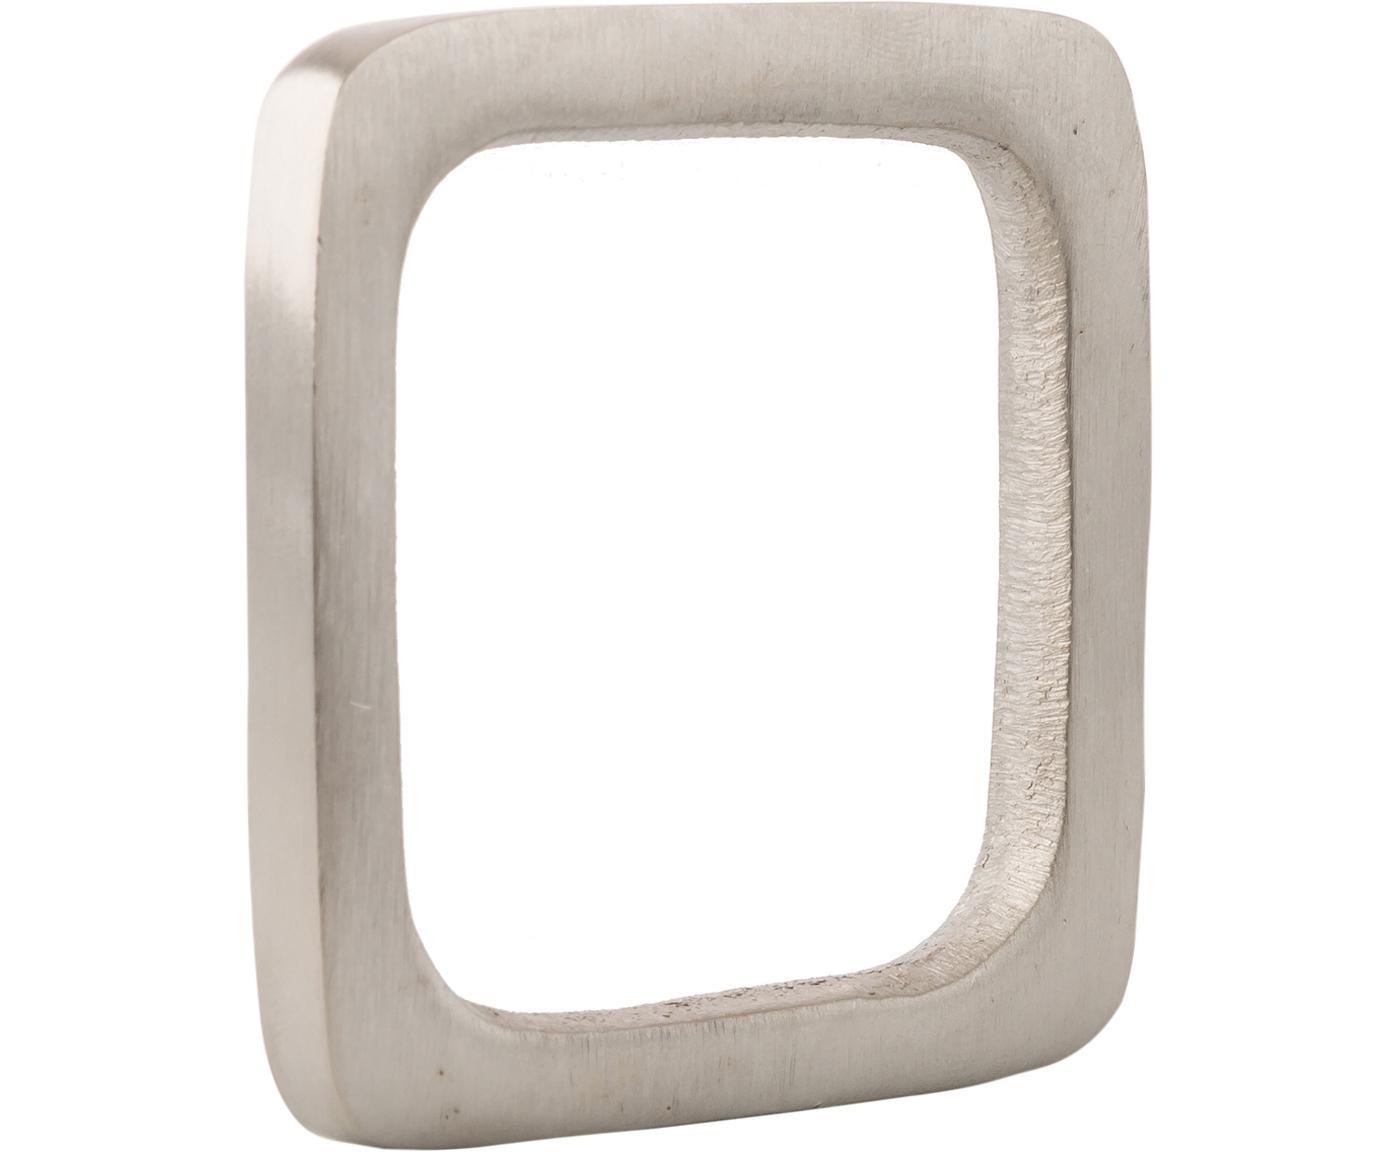 Serviettenringe Squark, 4 Stück, Aluminium, vernickelt, Nickel, 5 x 5 cm